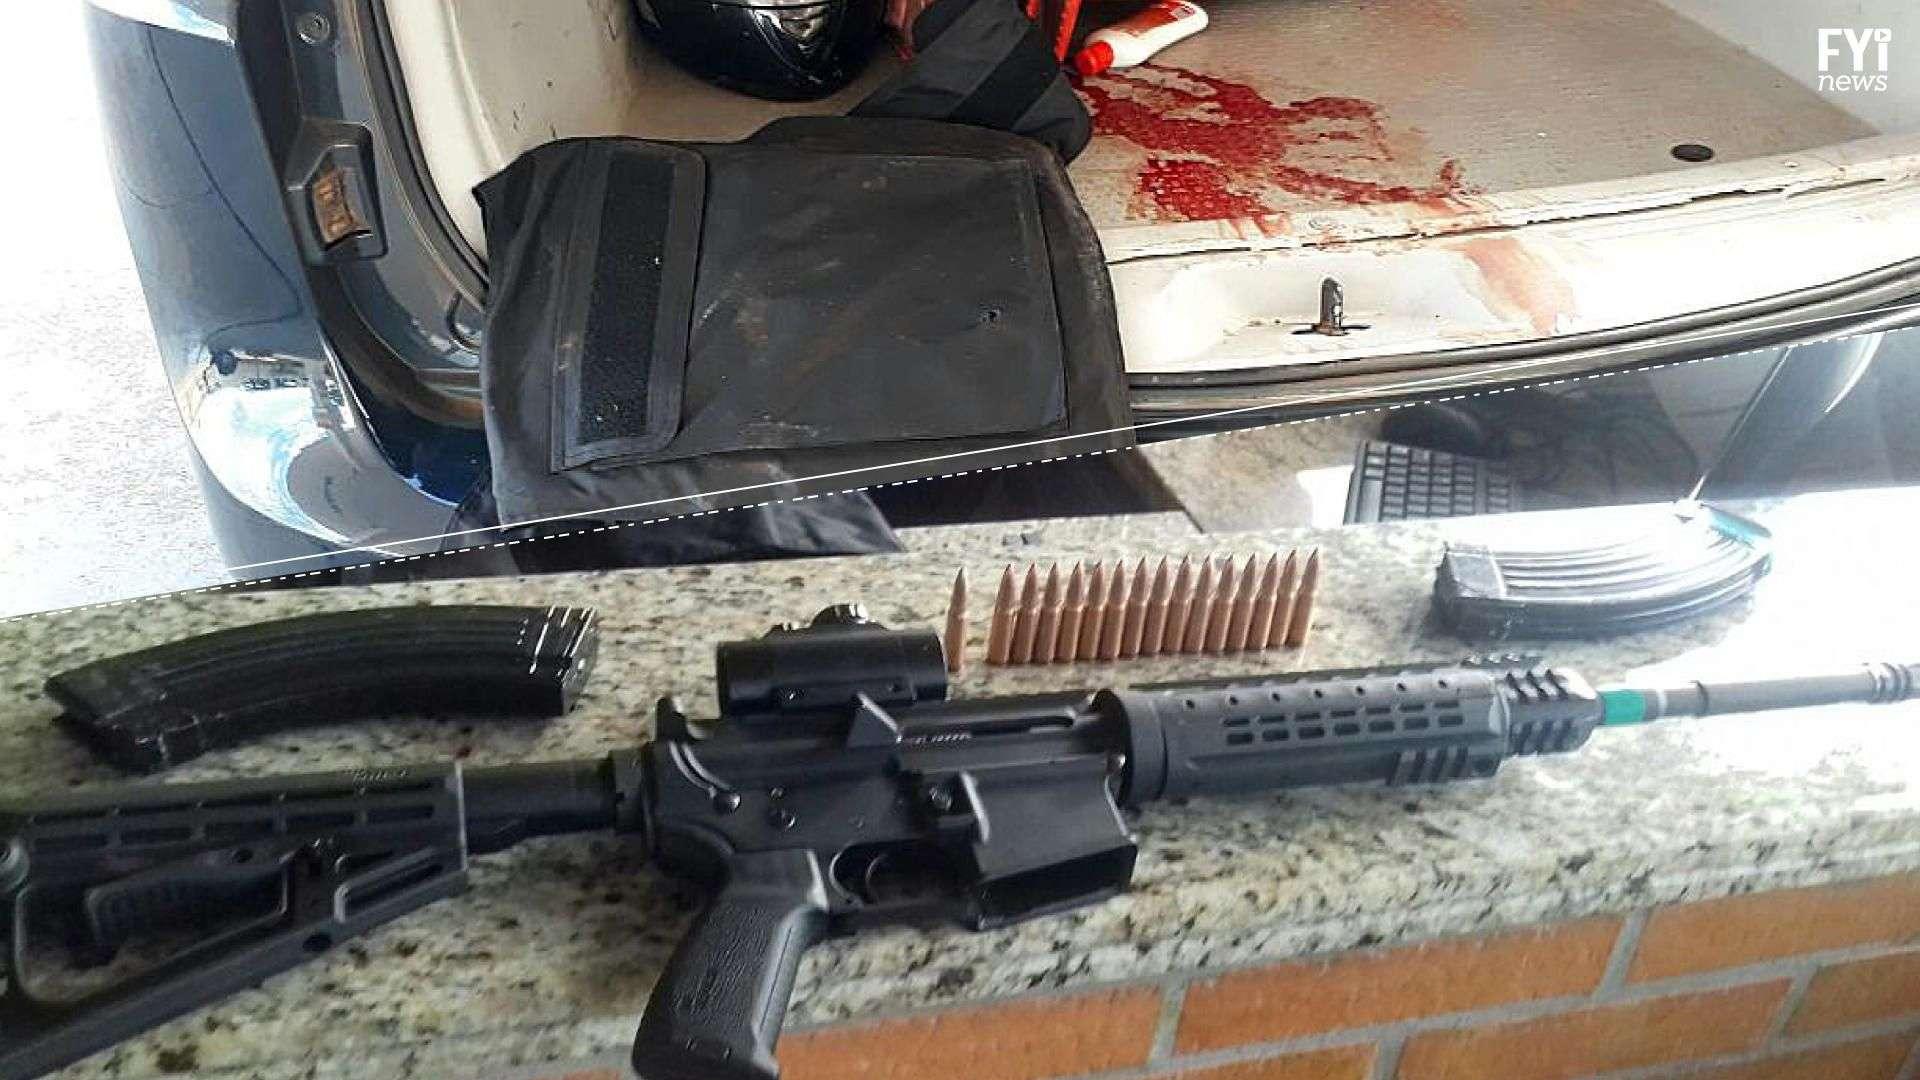 Persecución y tiroteo en Brasil por un mega robo en Paraguay